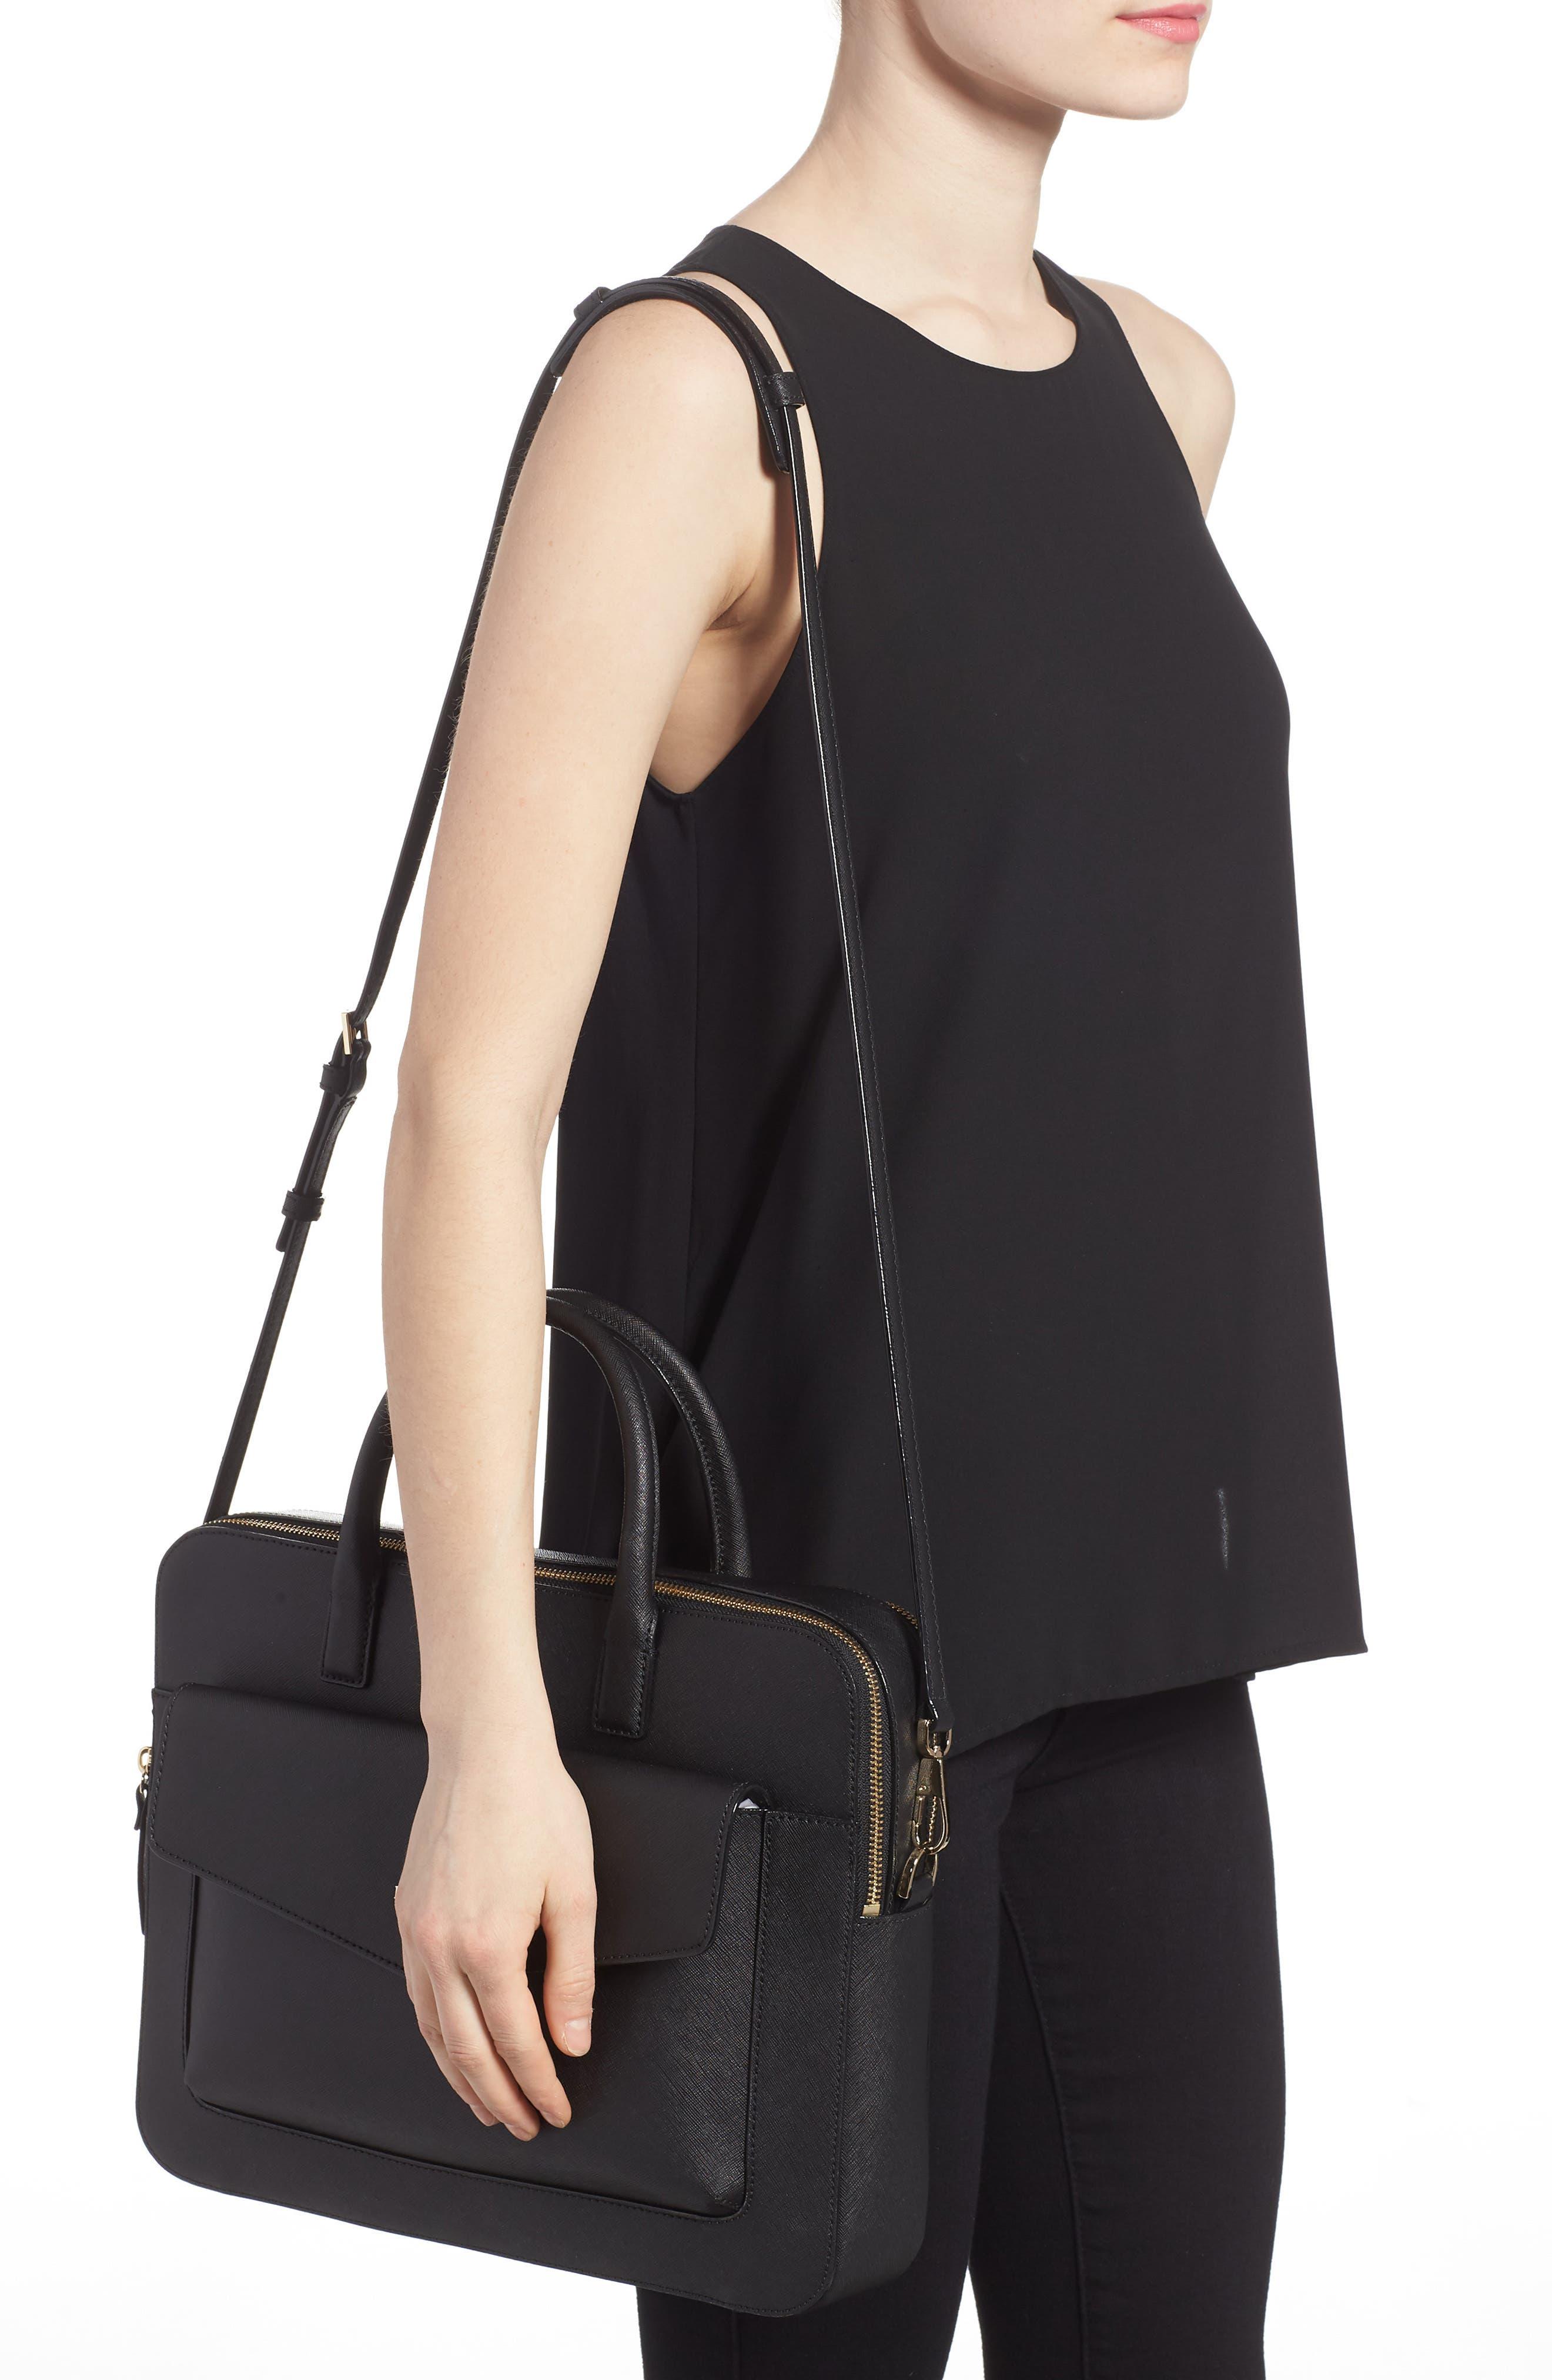 KATE SPADE NEW YORK,                             13-inch leather laptop bag,                             Alternate thumbnail 2, color,                             BLACK